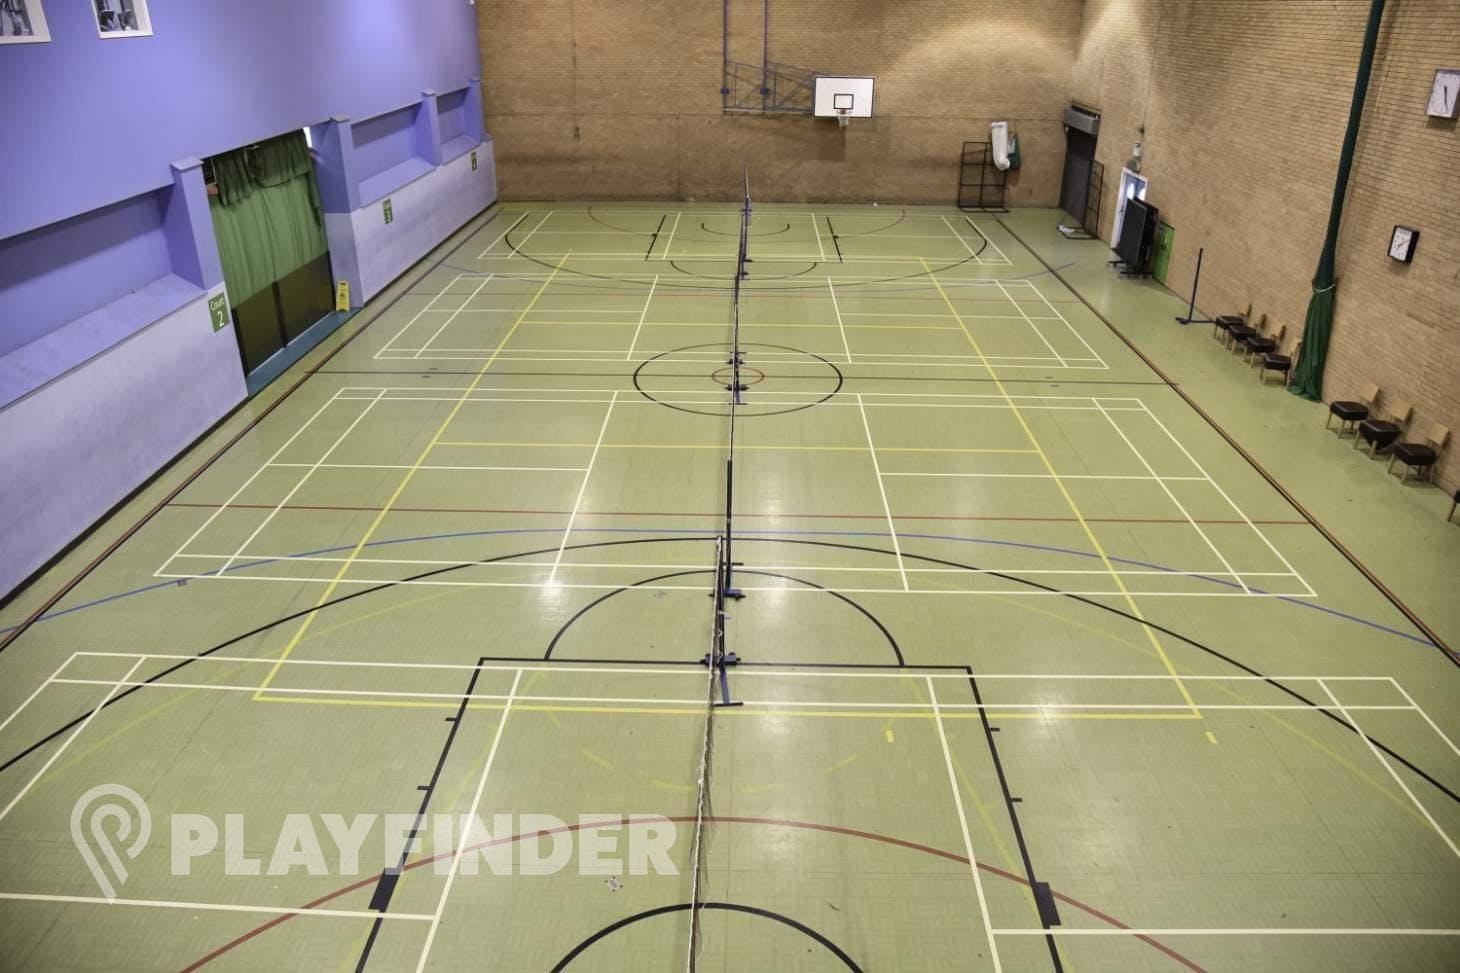 Waterfront Leisure Centre Half court | Sports hall basketball court